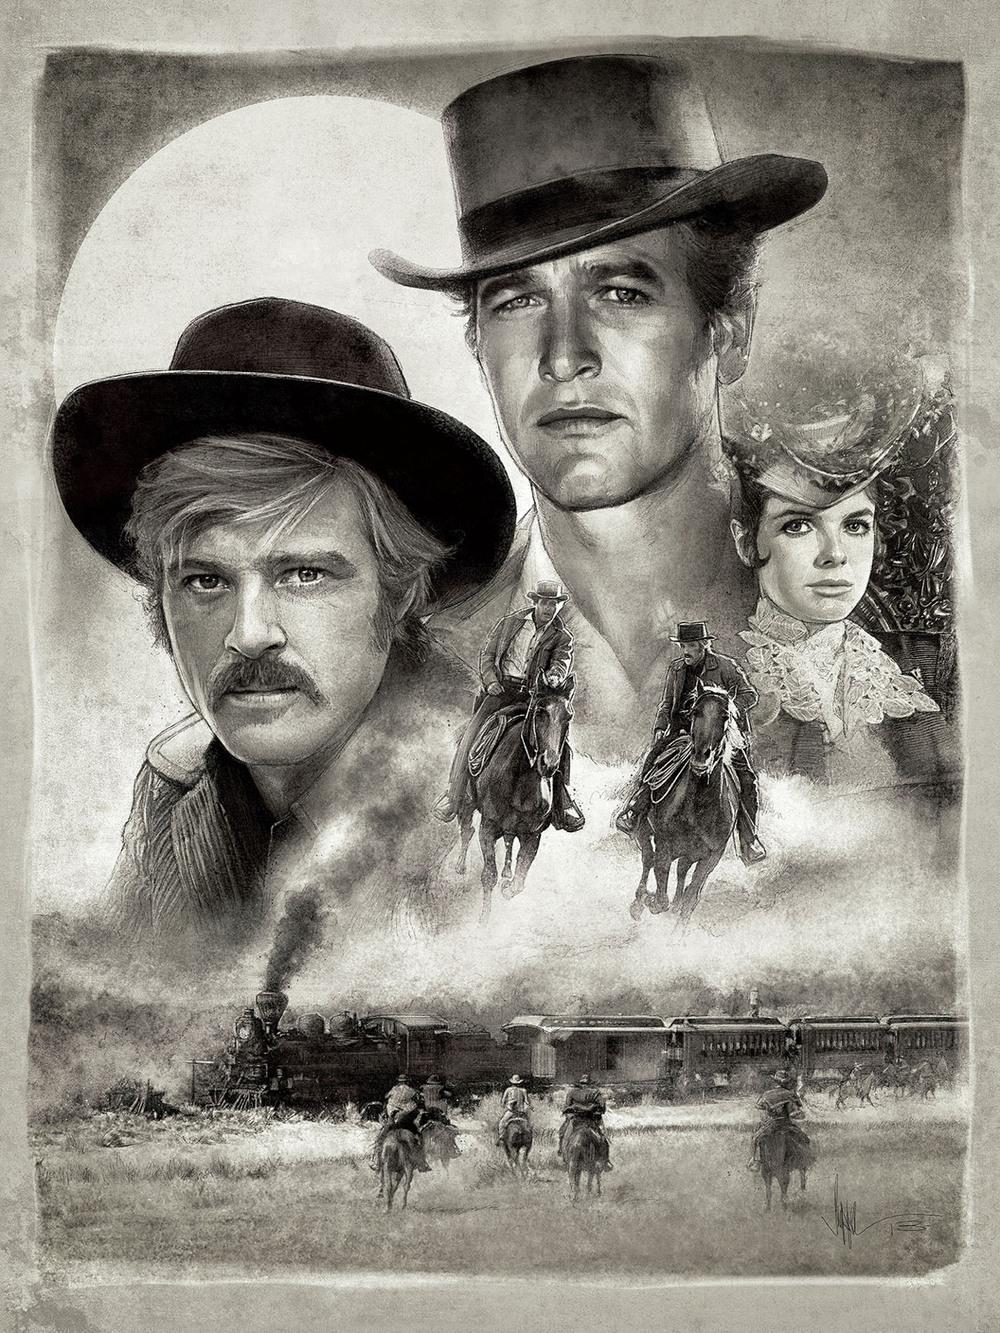 Butch and Sundance_web.jpg